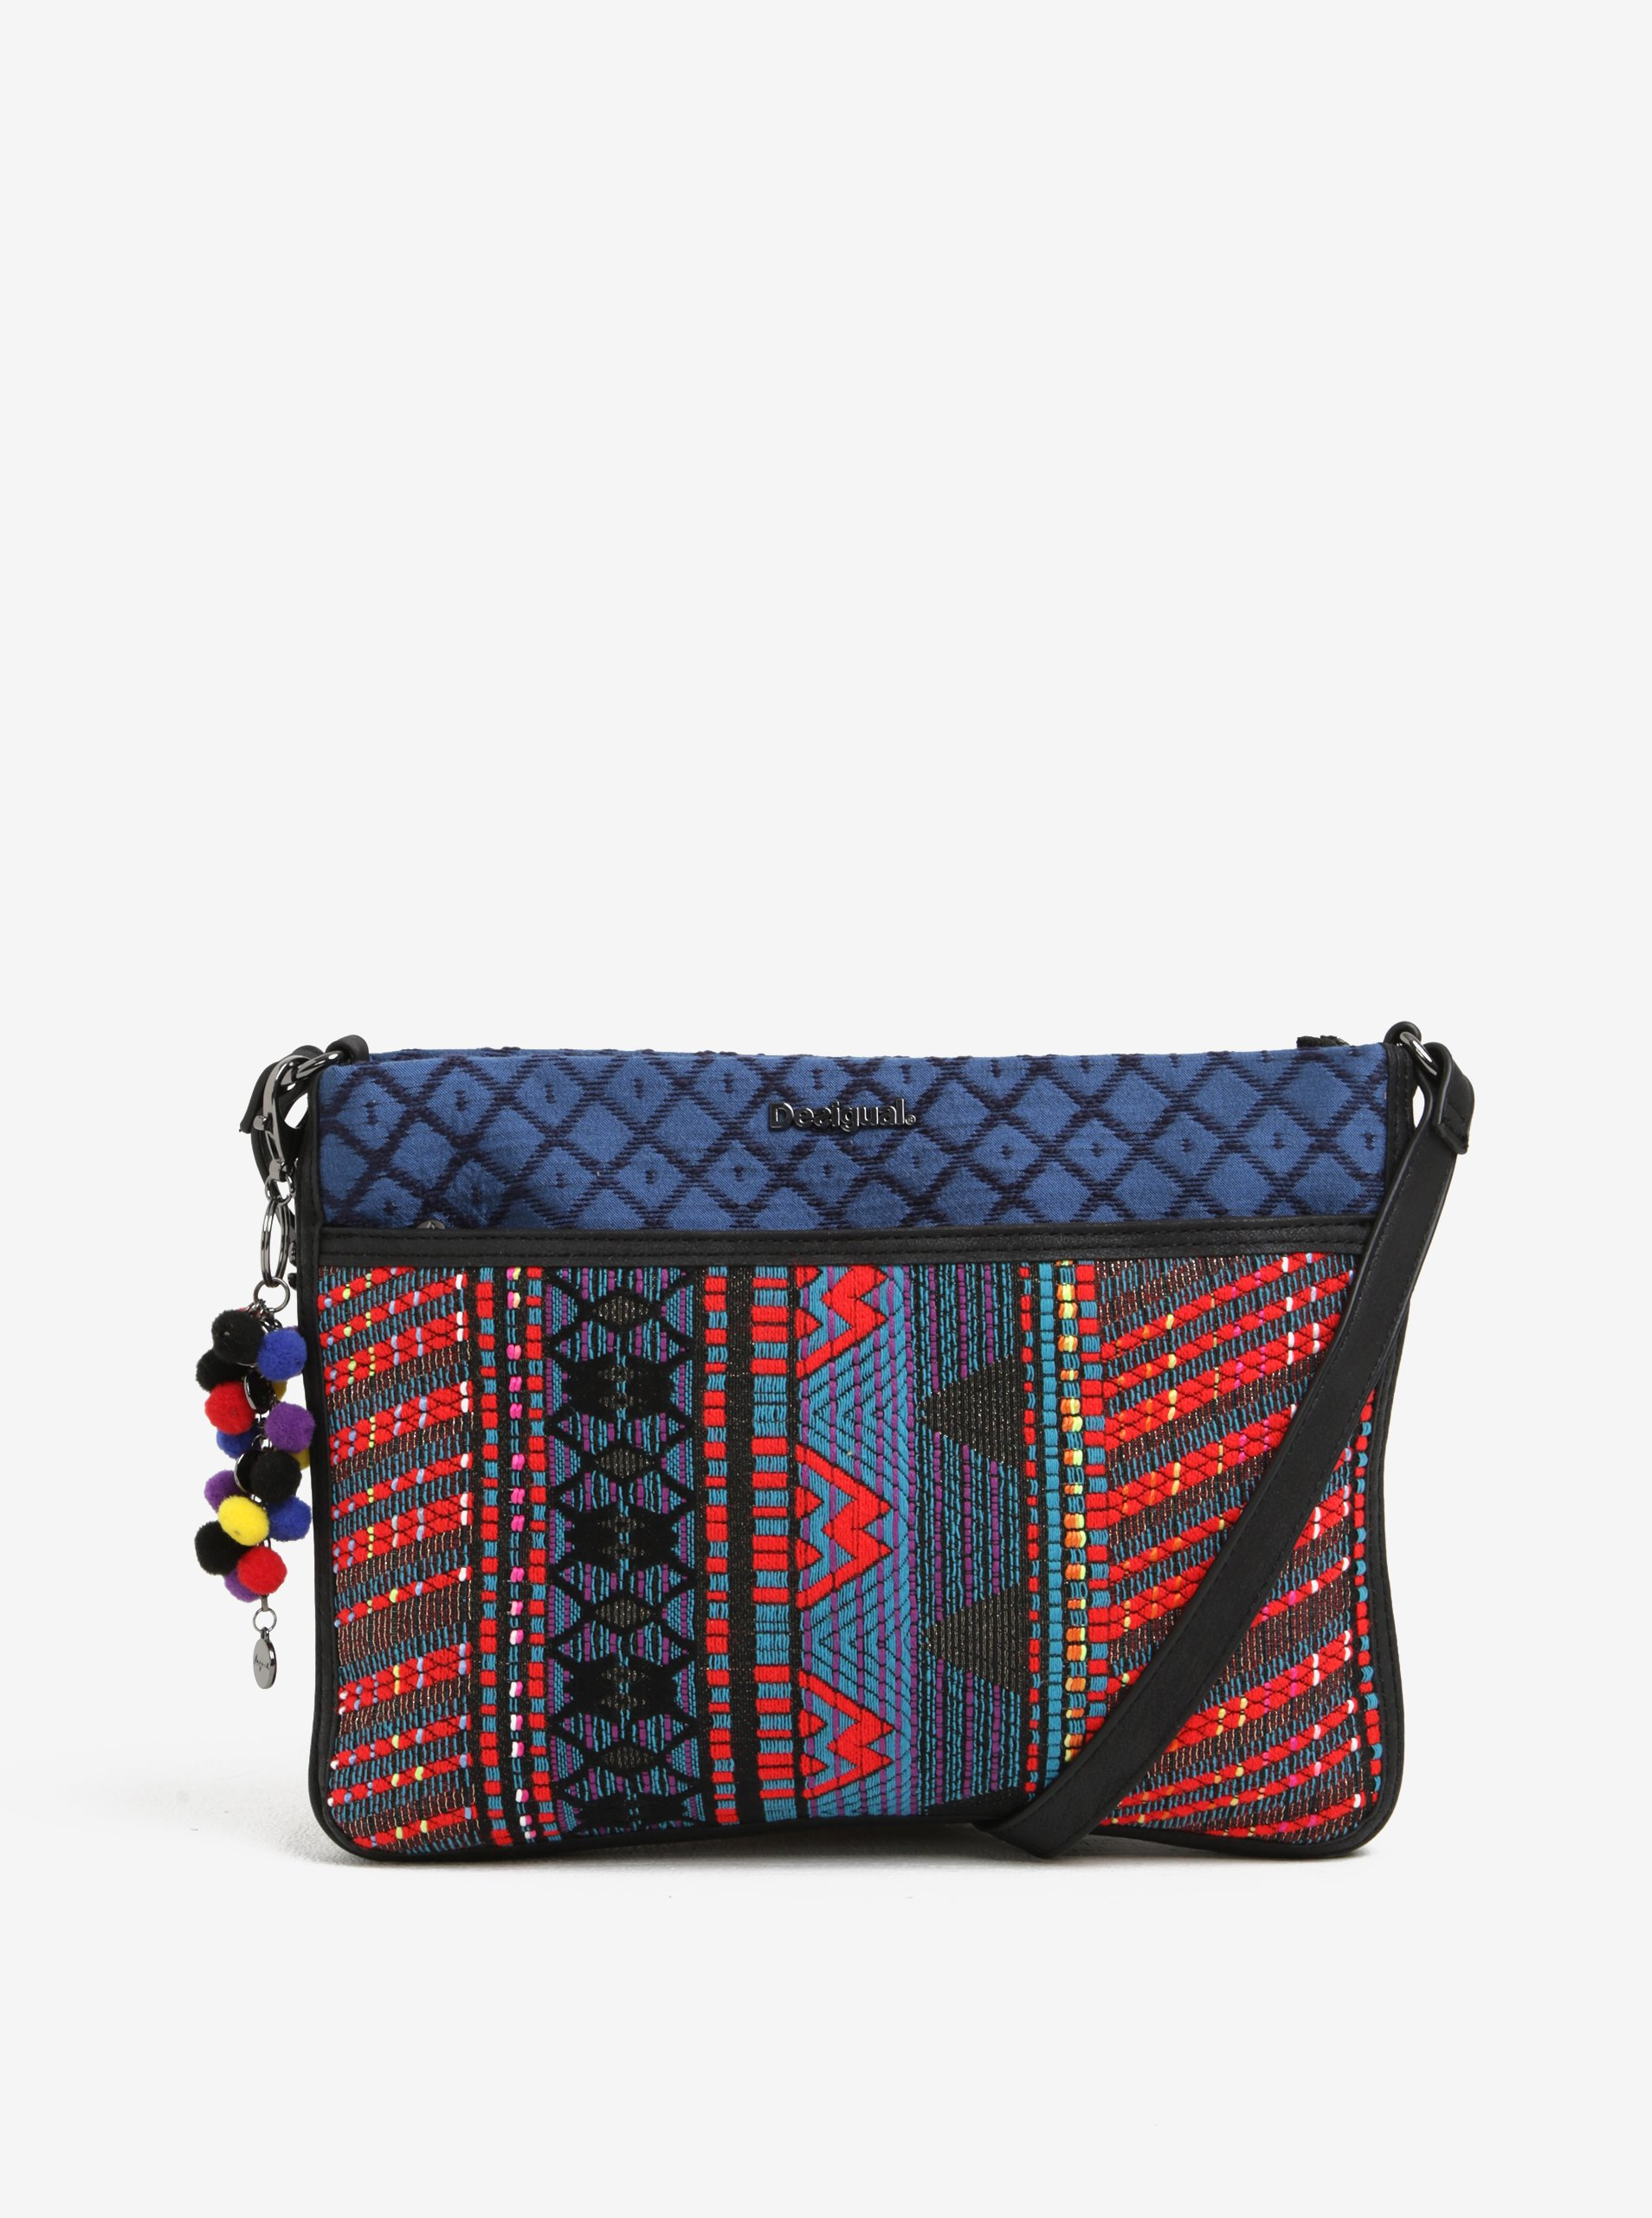 Červeno-modrá crossbody kabelka Desigual Formigal Togo